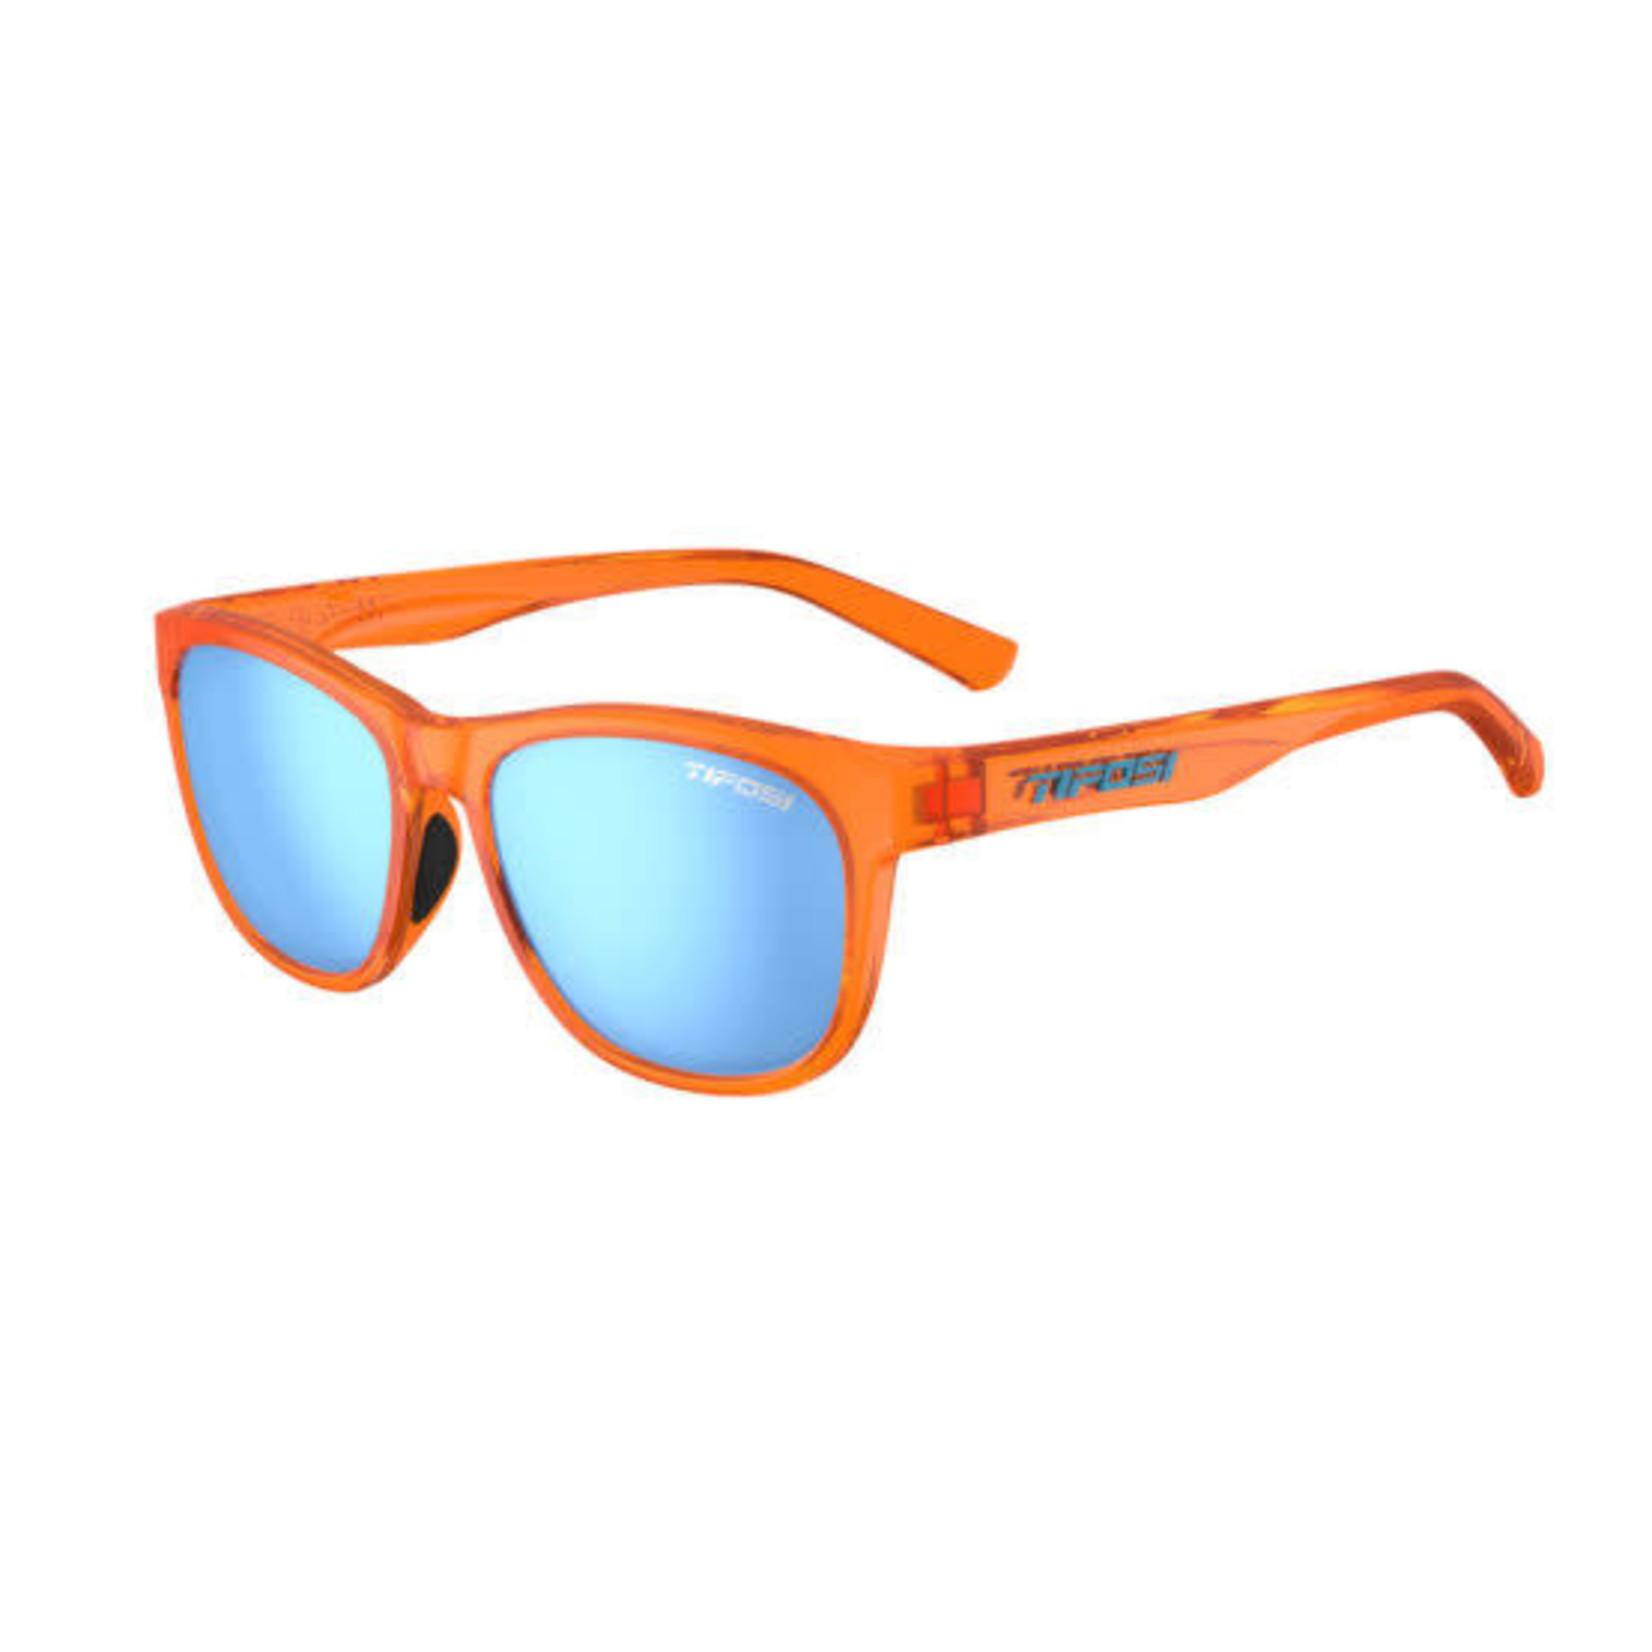 Tifosi Optics Swank, Crystal Orange Single Lens Sunglasses